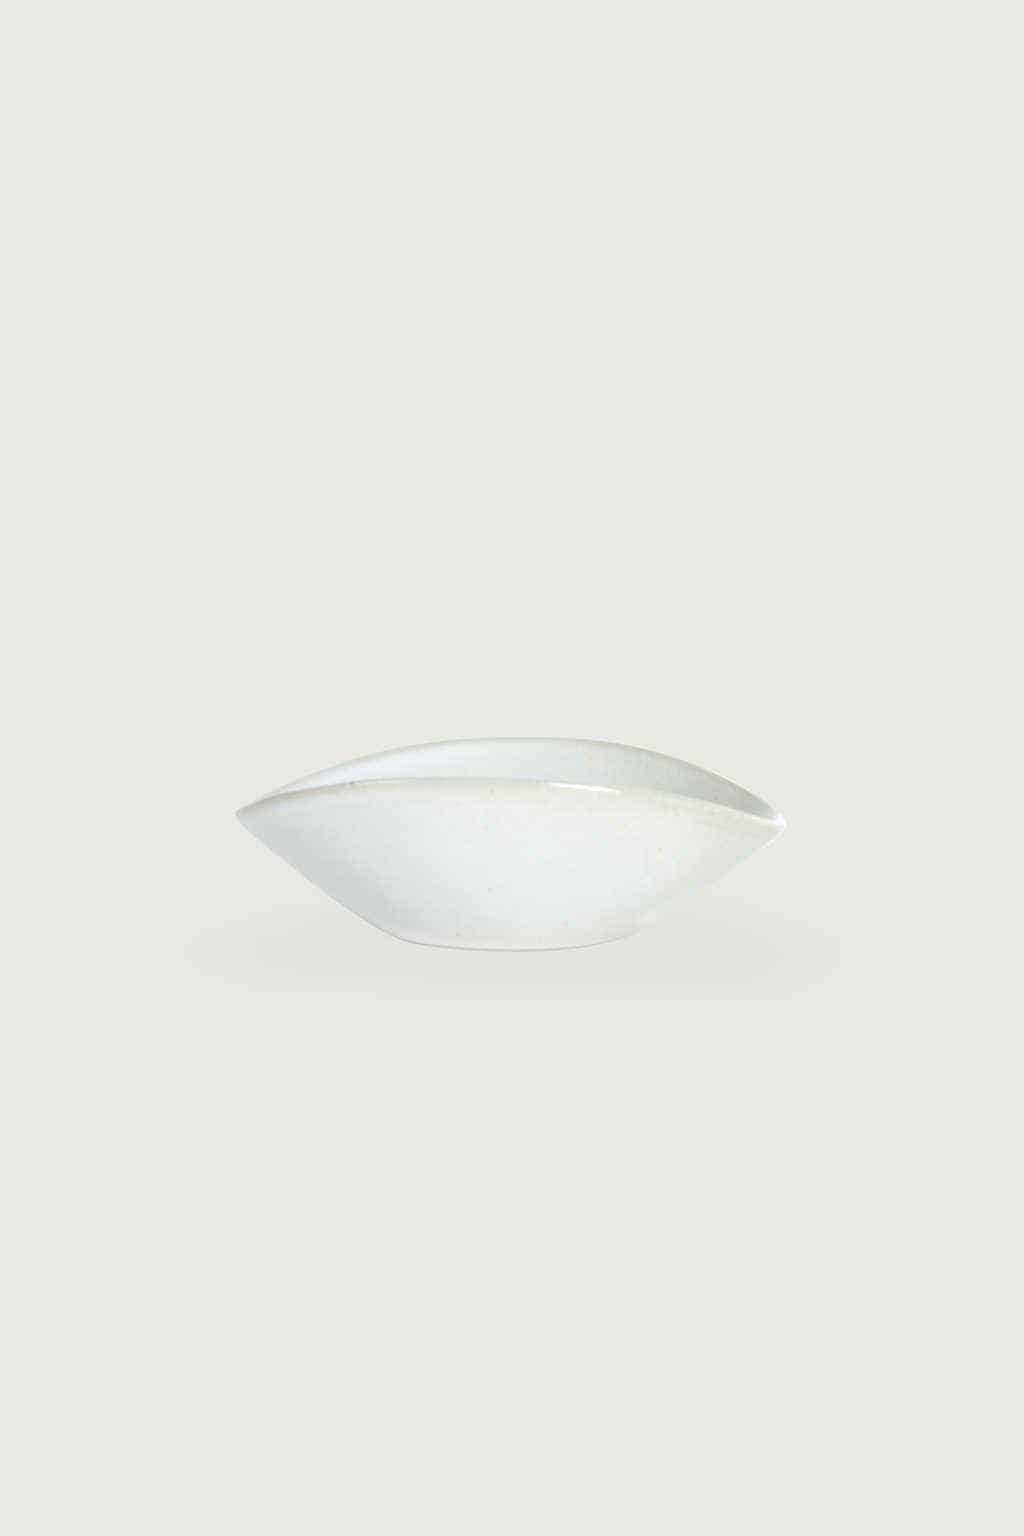 Small Ceramic Bowl 3295 Ivory 3